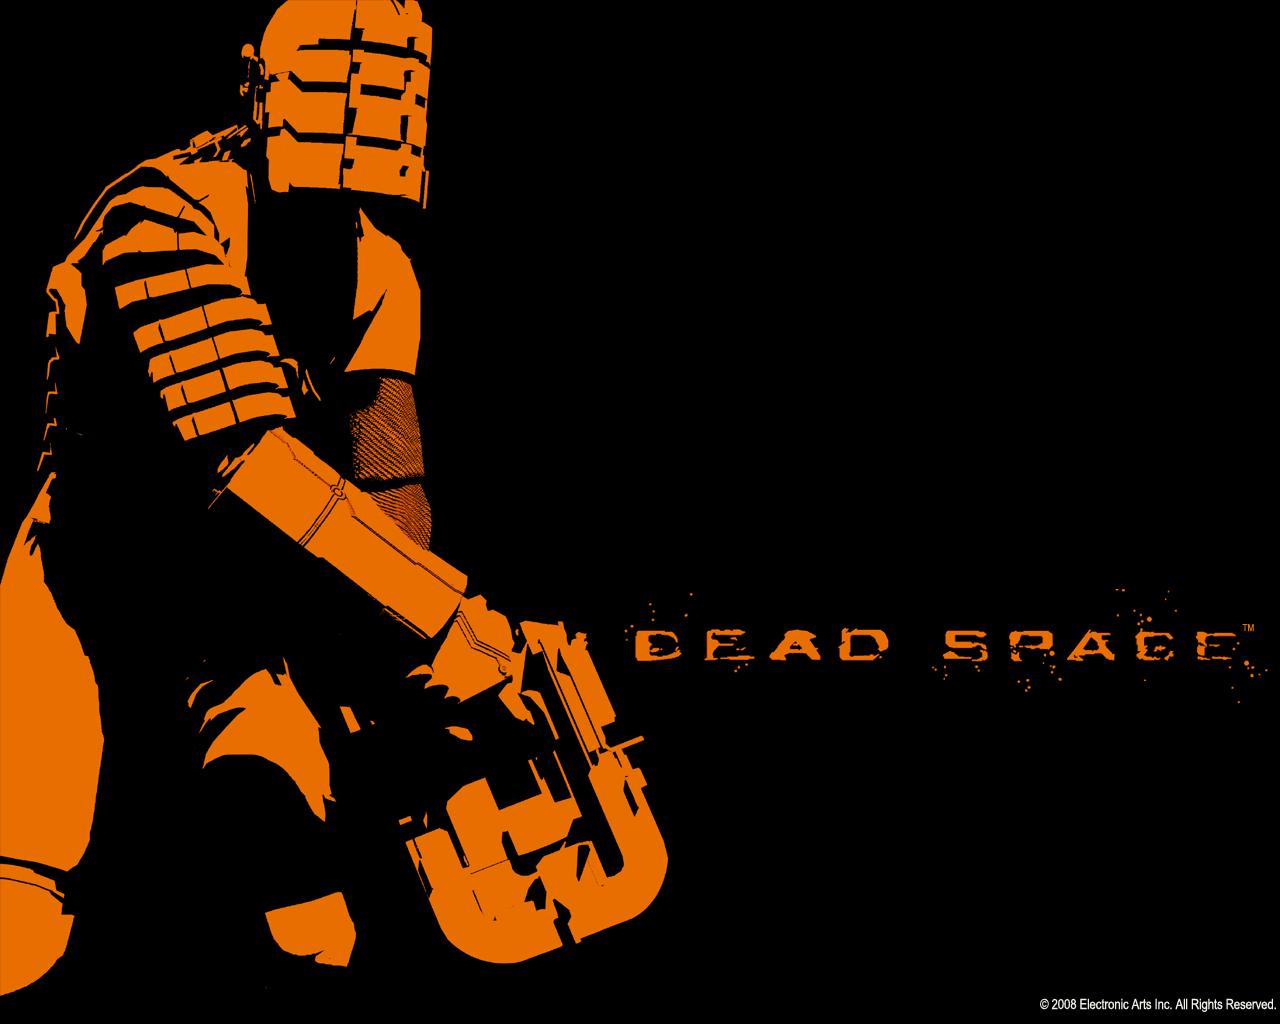 dead space picture